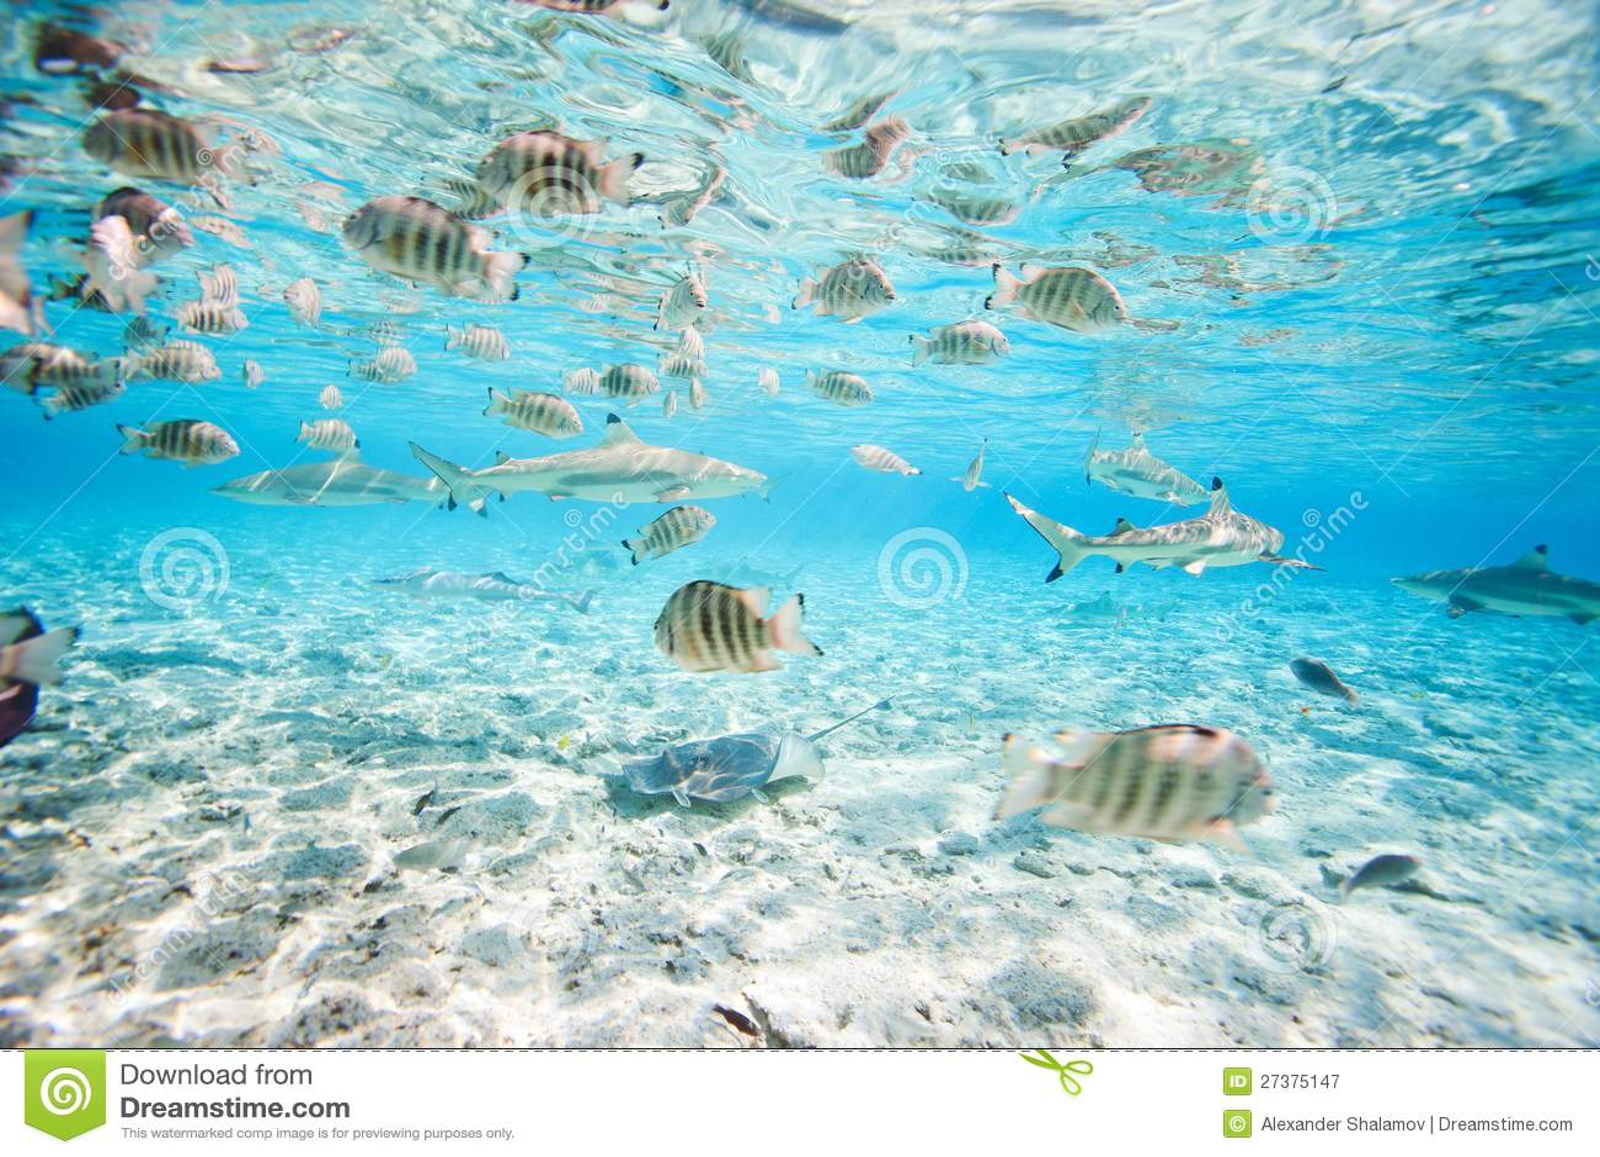 bora bora underwater royalty free stock photography stingray clipart black stingray clipart black and white